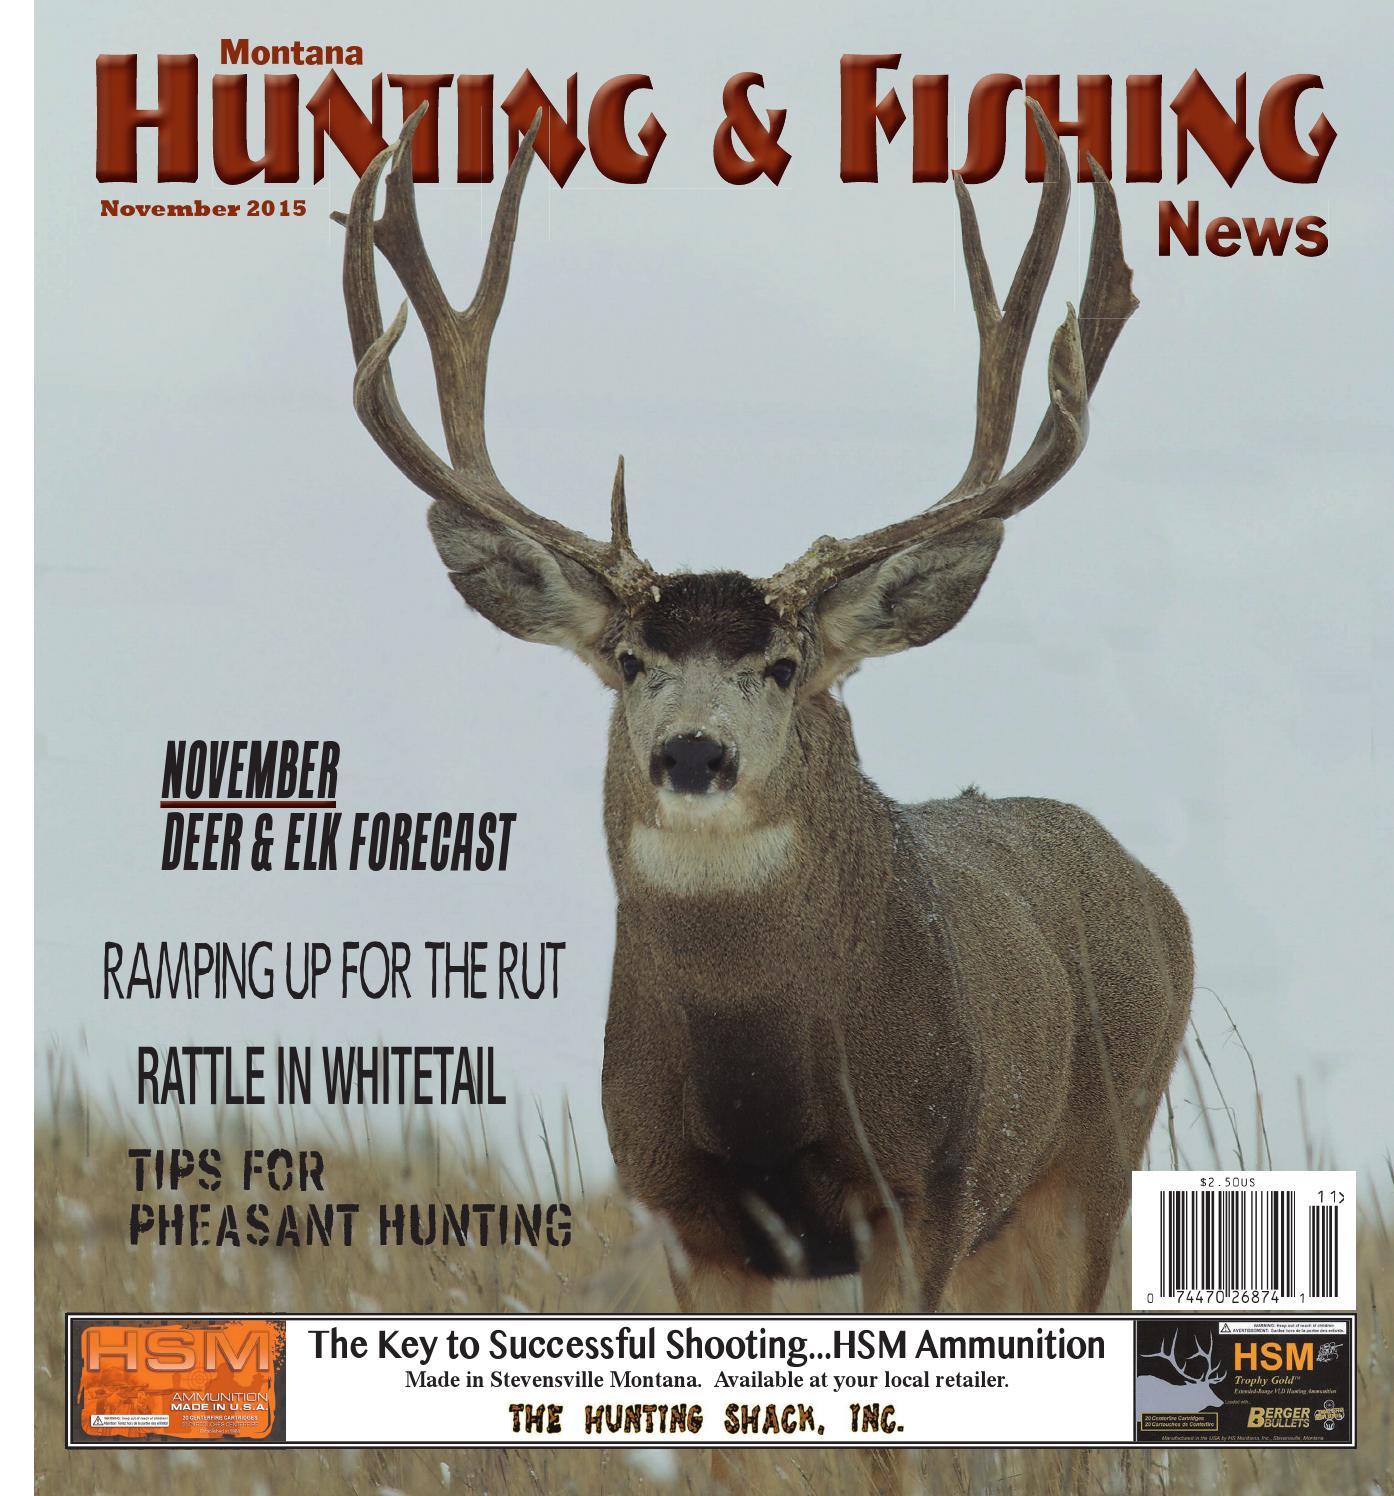 Montana Hunting & Fishing News - November 2015 By Amy